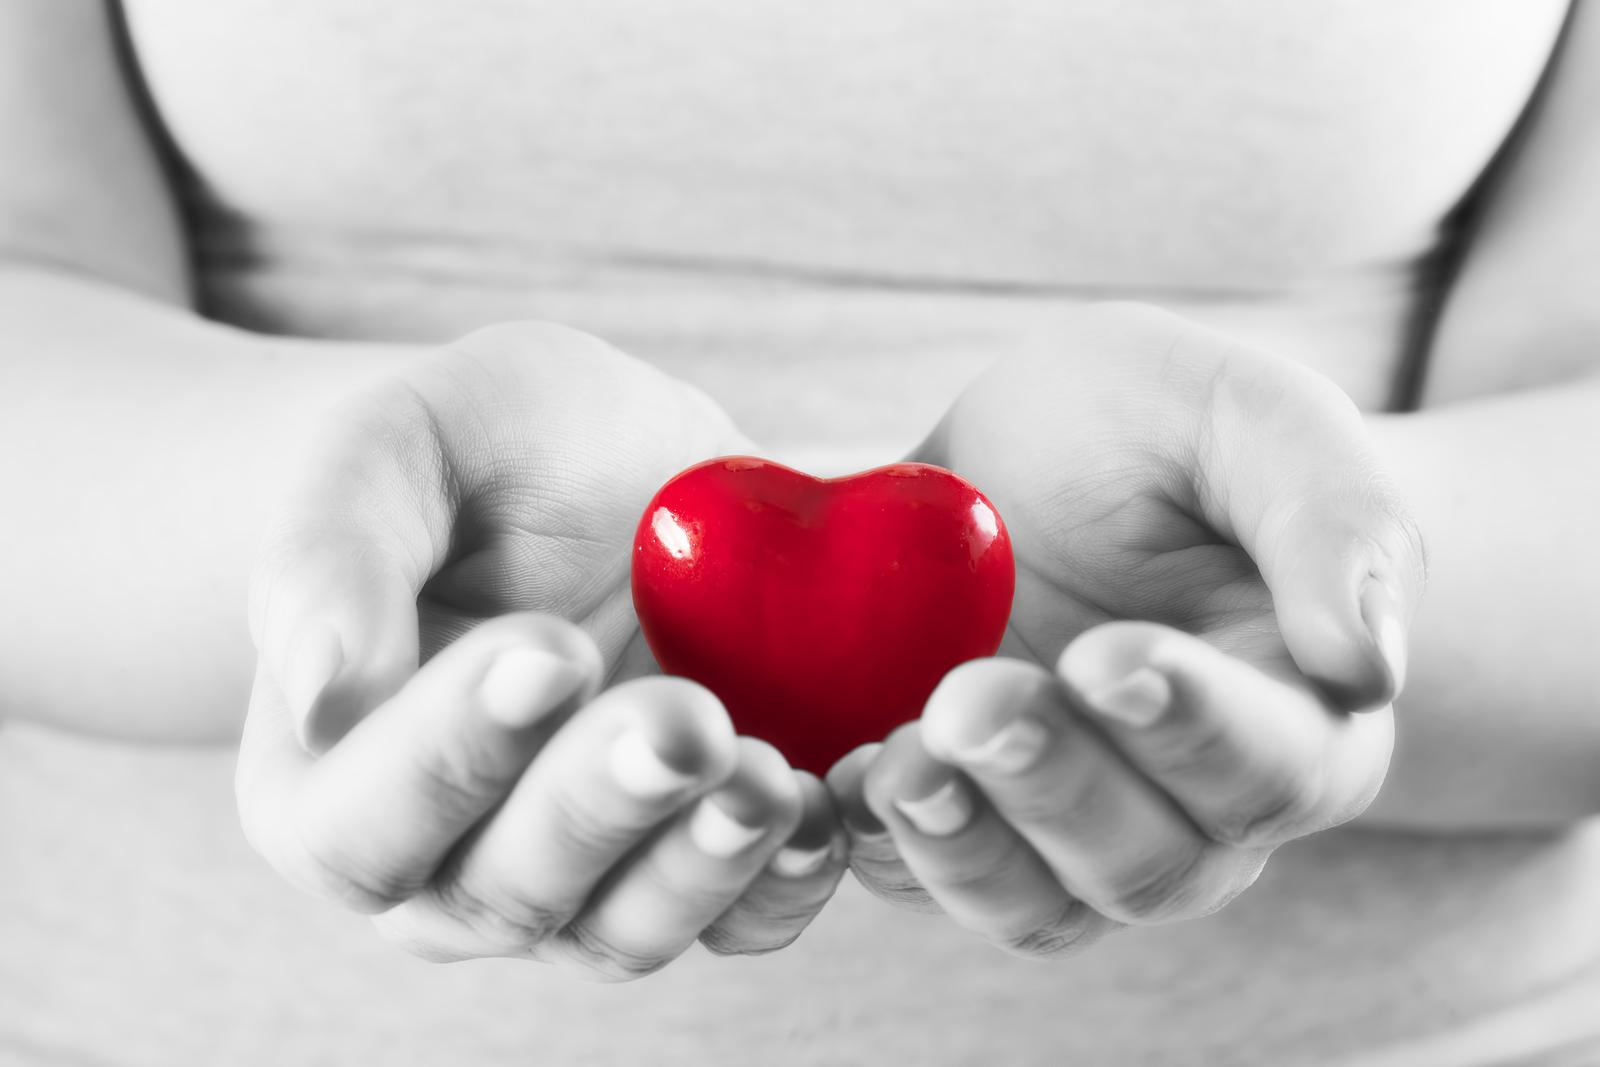 bigstock-Heart-in-woman-hands-Love-giv-87654197.jpg